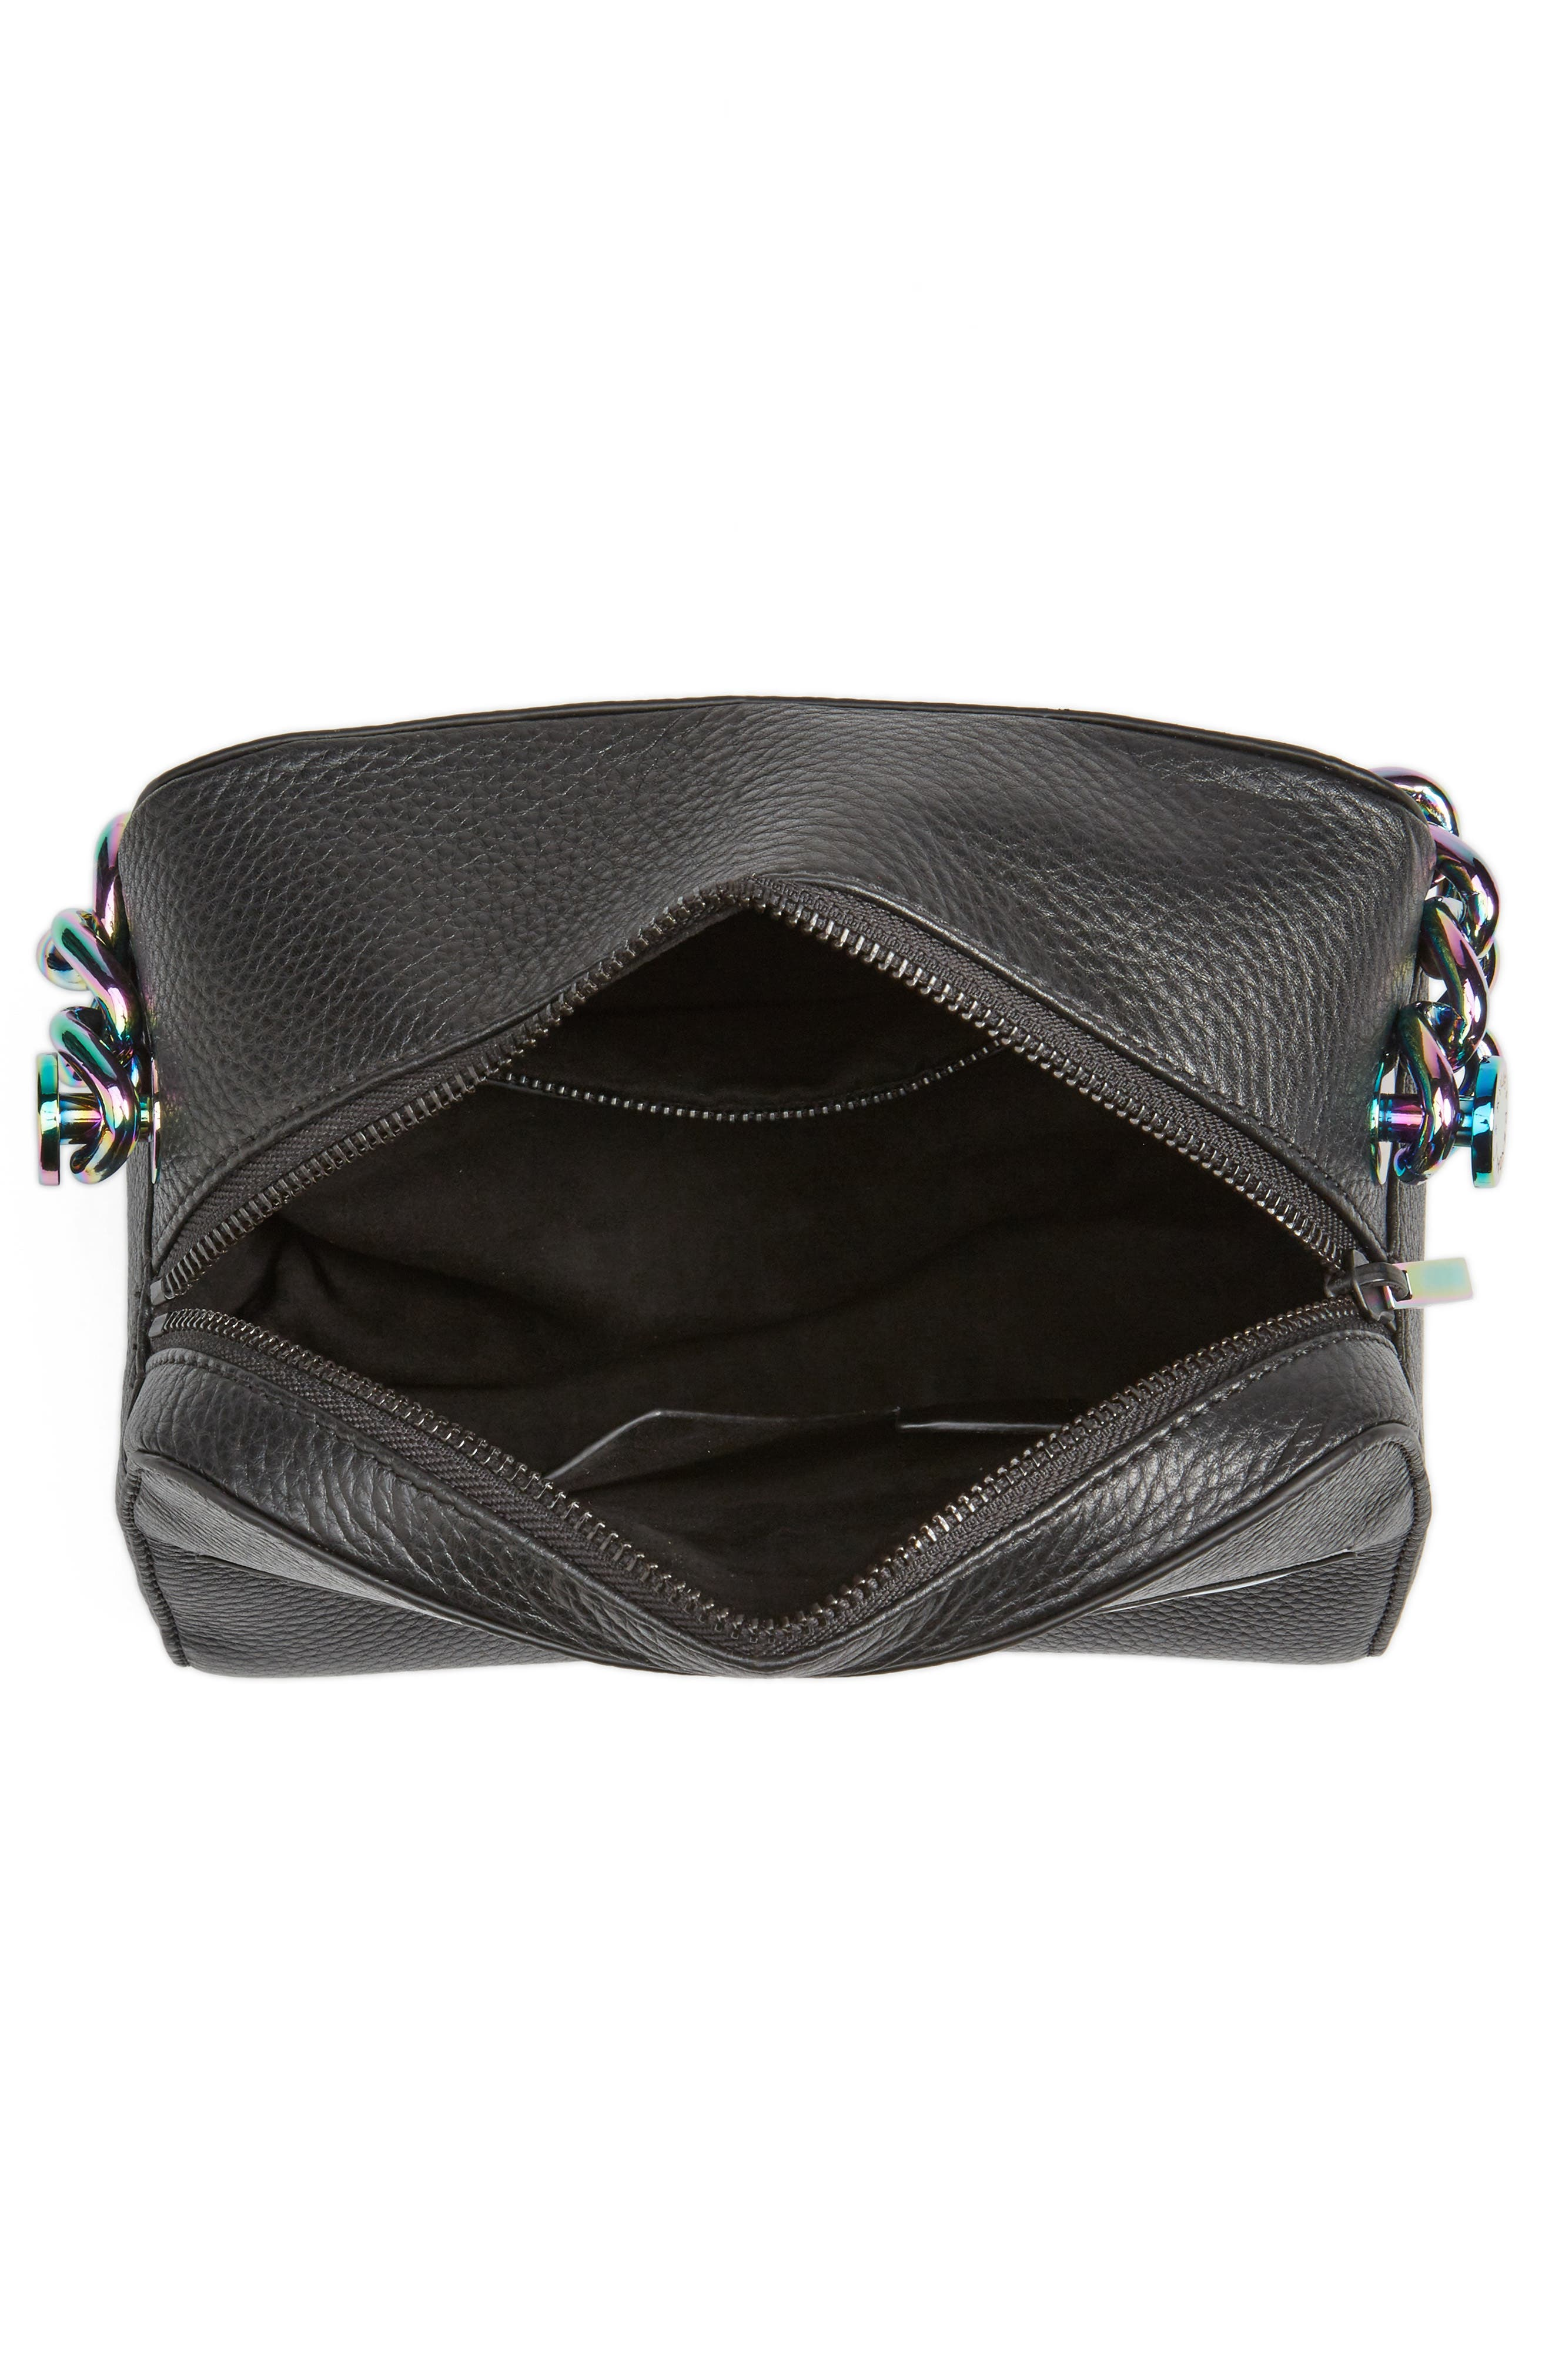 Lucy Lips Crossbody Bag,                             Alternate thumbnail 3, color,                             Black